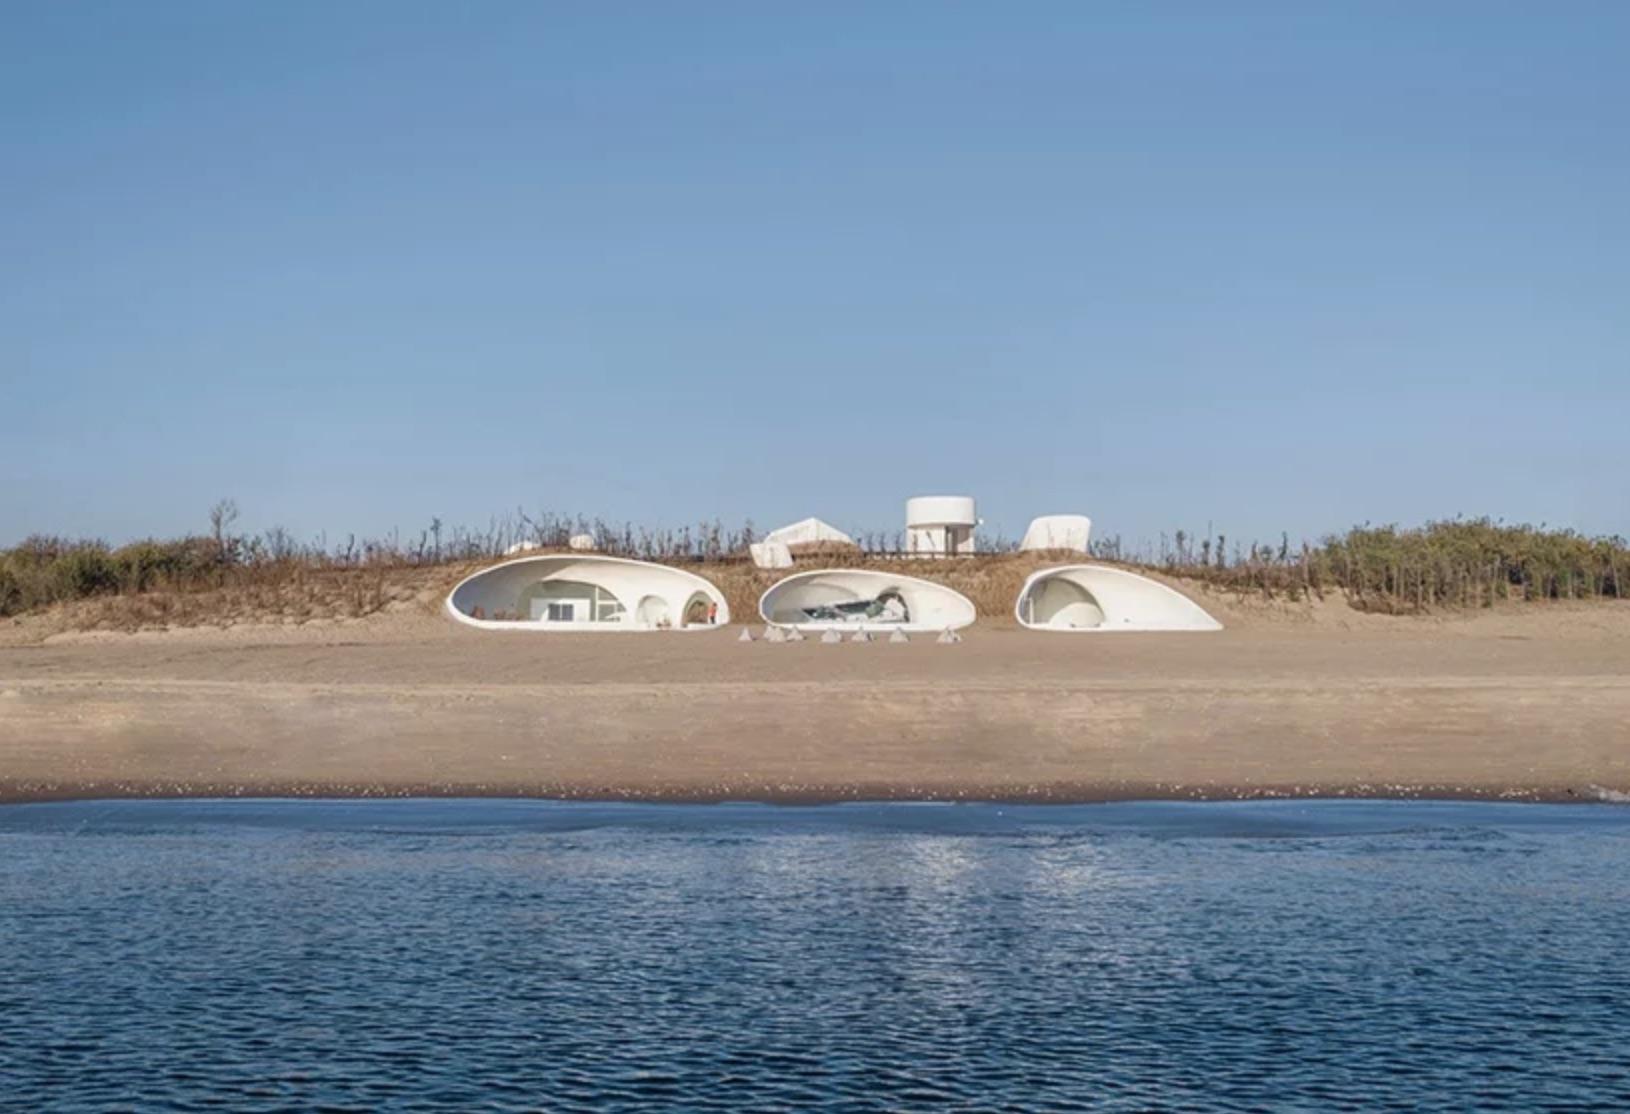 Building set into sand dune